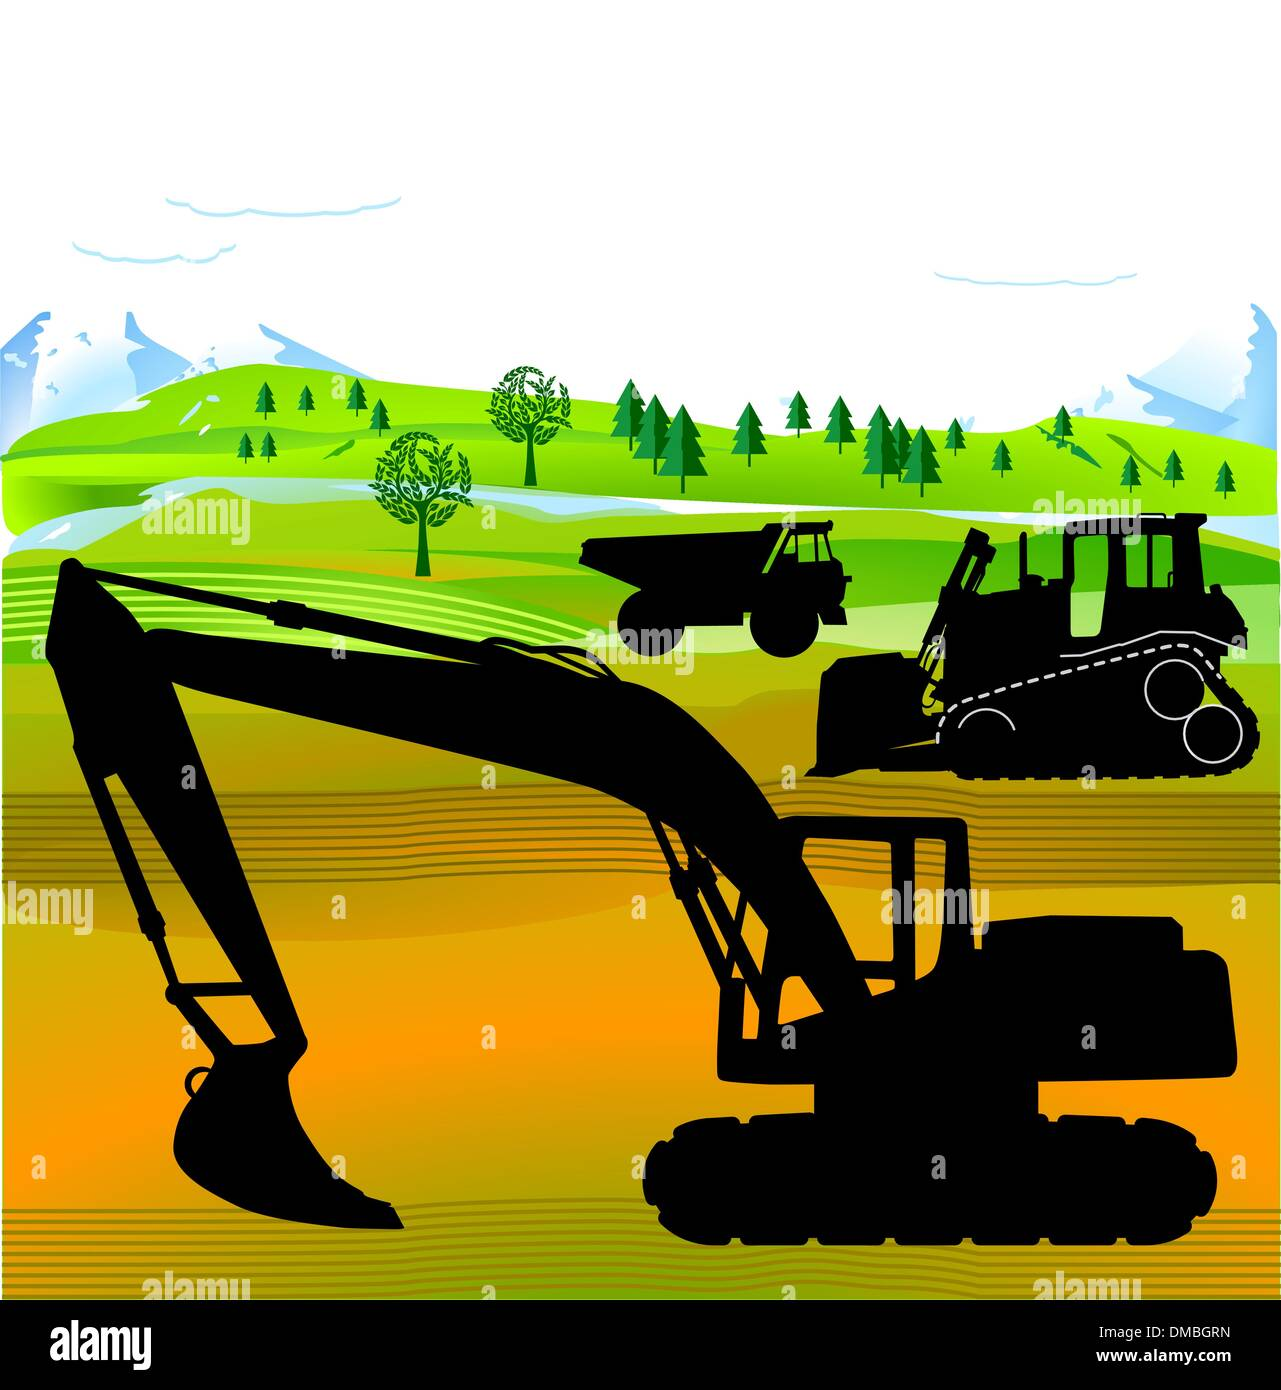 excavator and bulldozer - Stock Image